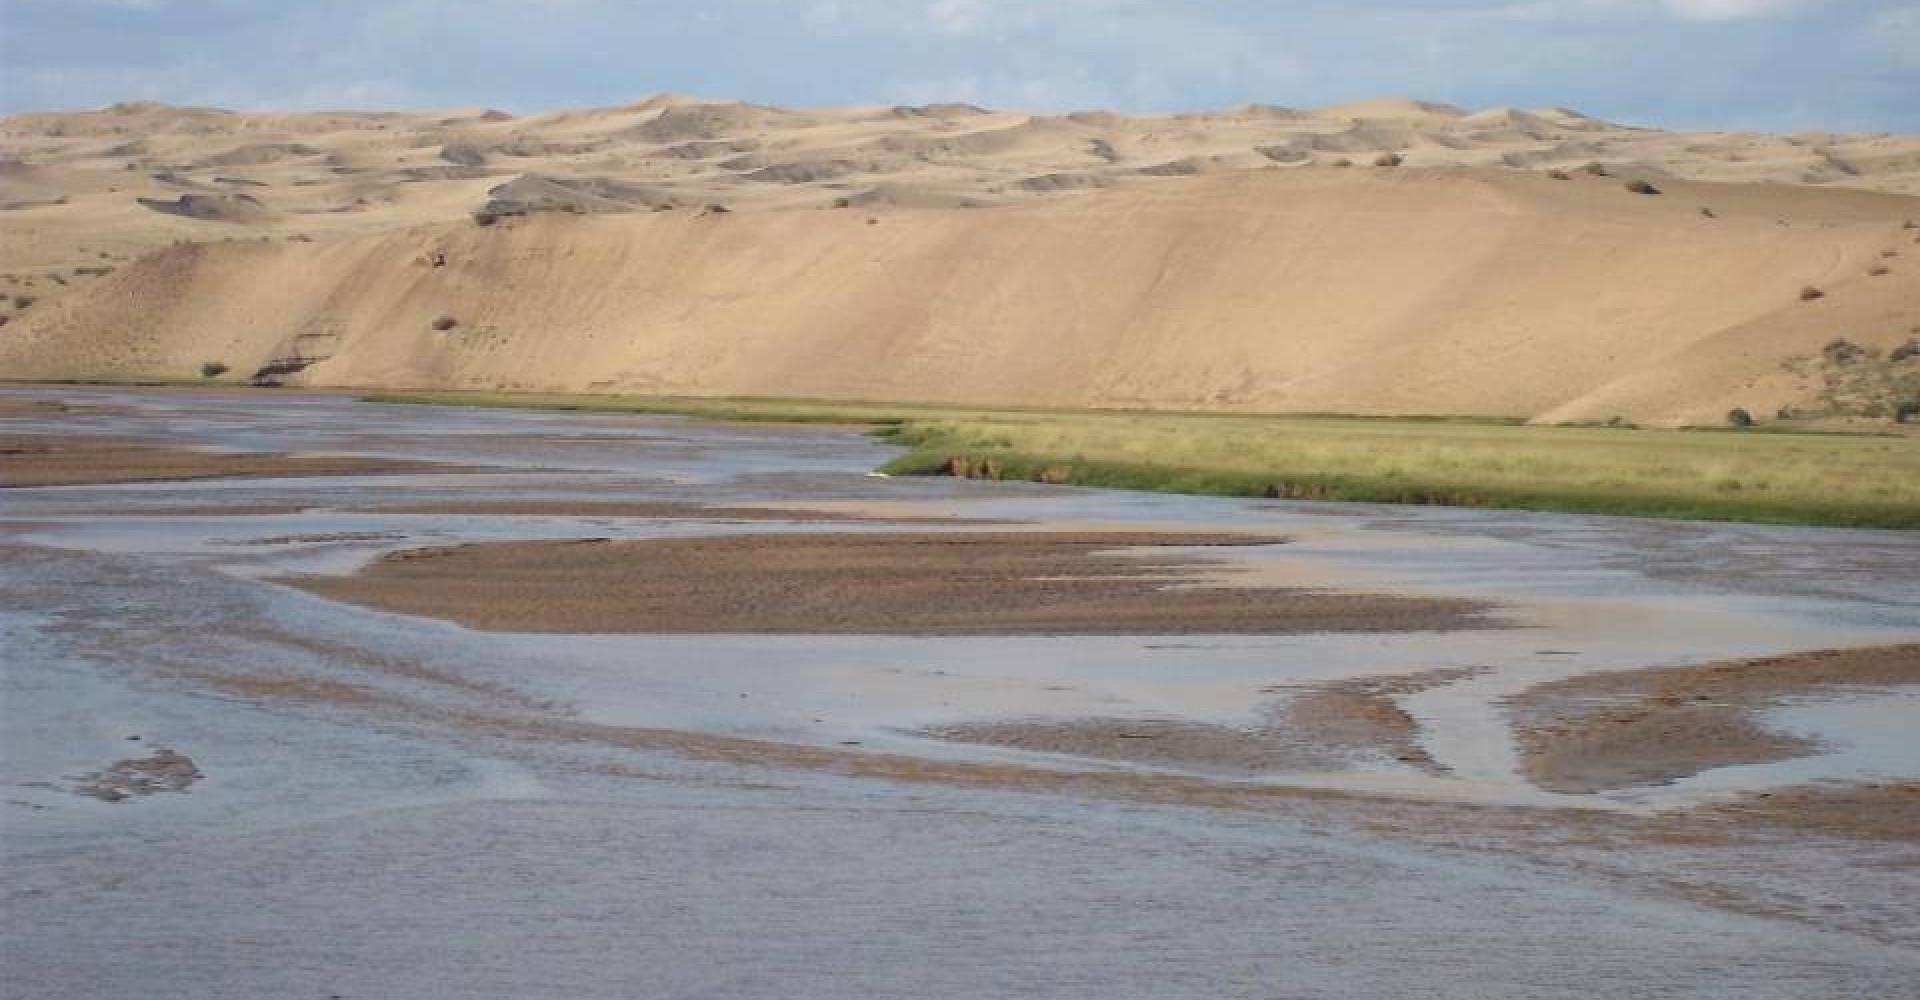 Bor Khyriin Elsen Suv /Bor Khyriin Sand Piece/